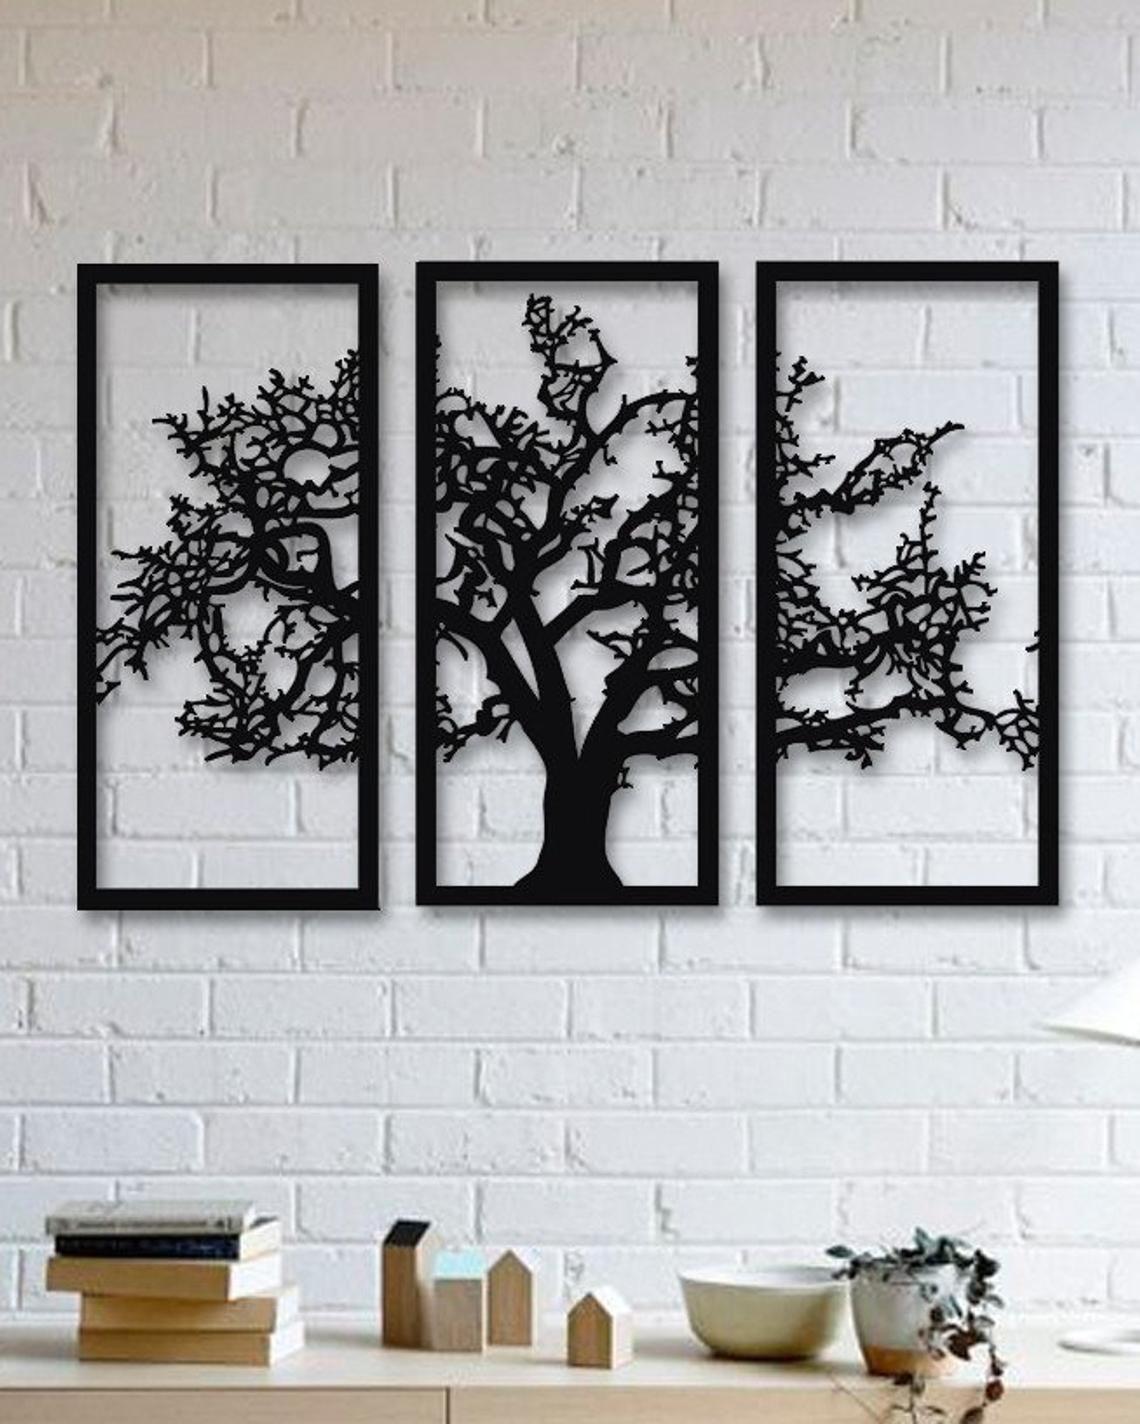 Tree of Life 20 Pieces Metal Wall Art, Modern Rustic Wall Decor ...